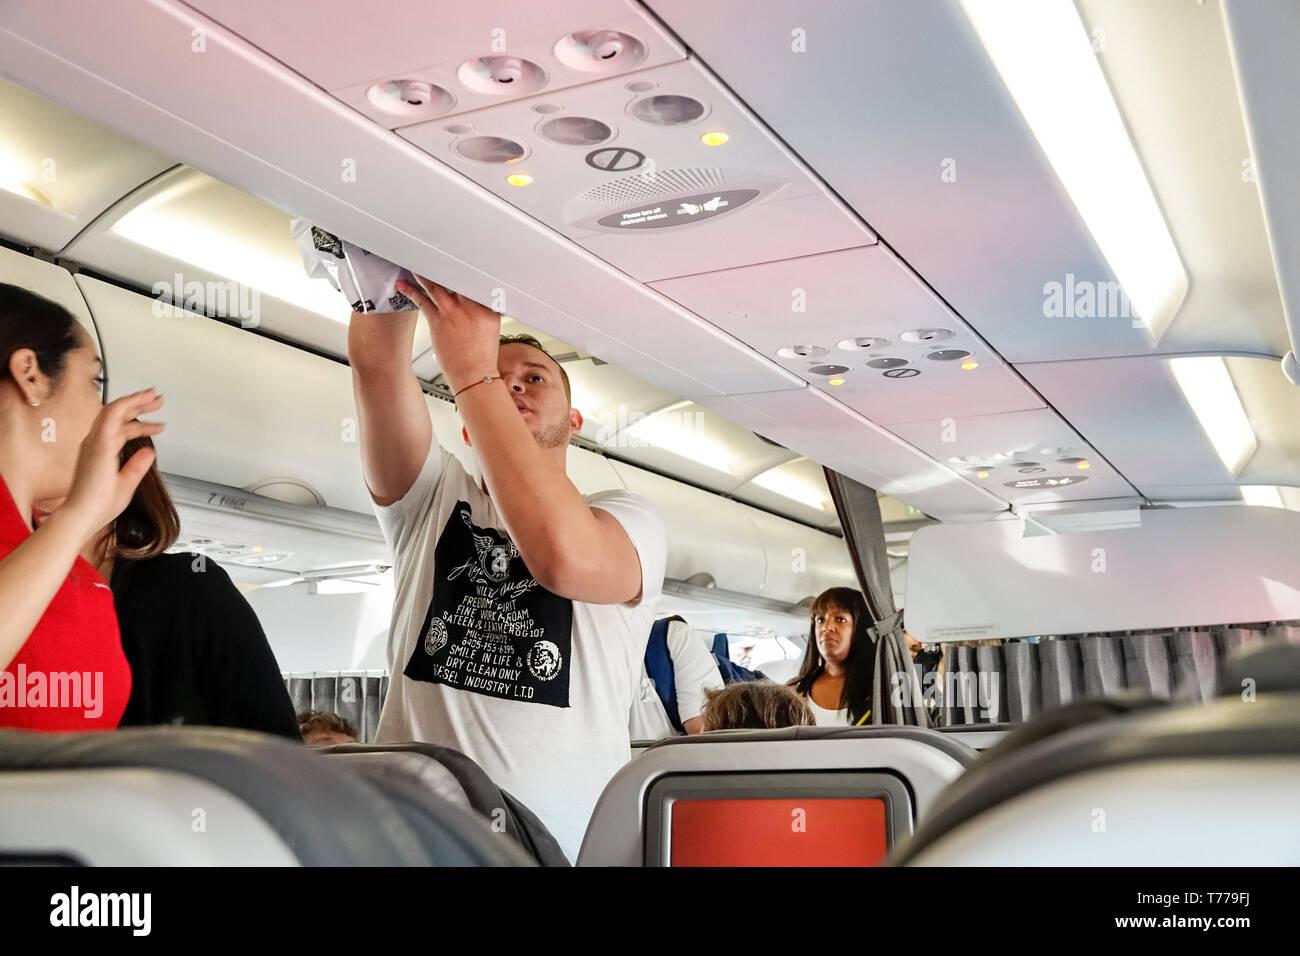 Miami Florida Miami International Airport MIA onboard cabin Avianca Airlines flight AV 35 man storing luggage overhead bin - Stock Image